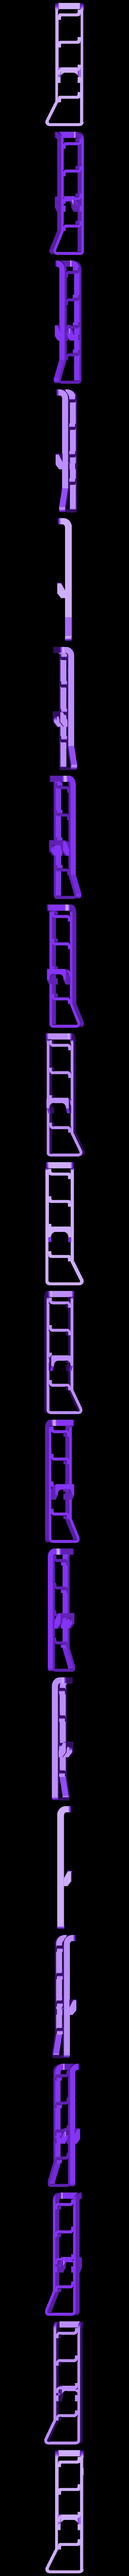 Cab_Ladder.STL Download free STL file 4-8-8-4 Big Boy Locomotive • 3D printer object, RaymondDeLuca